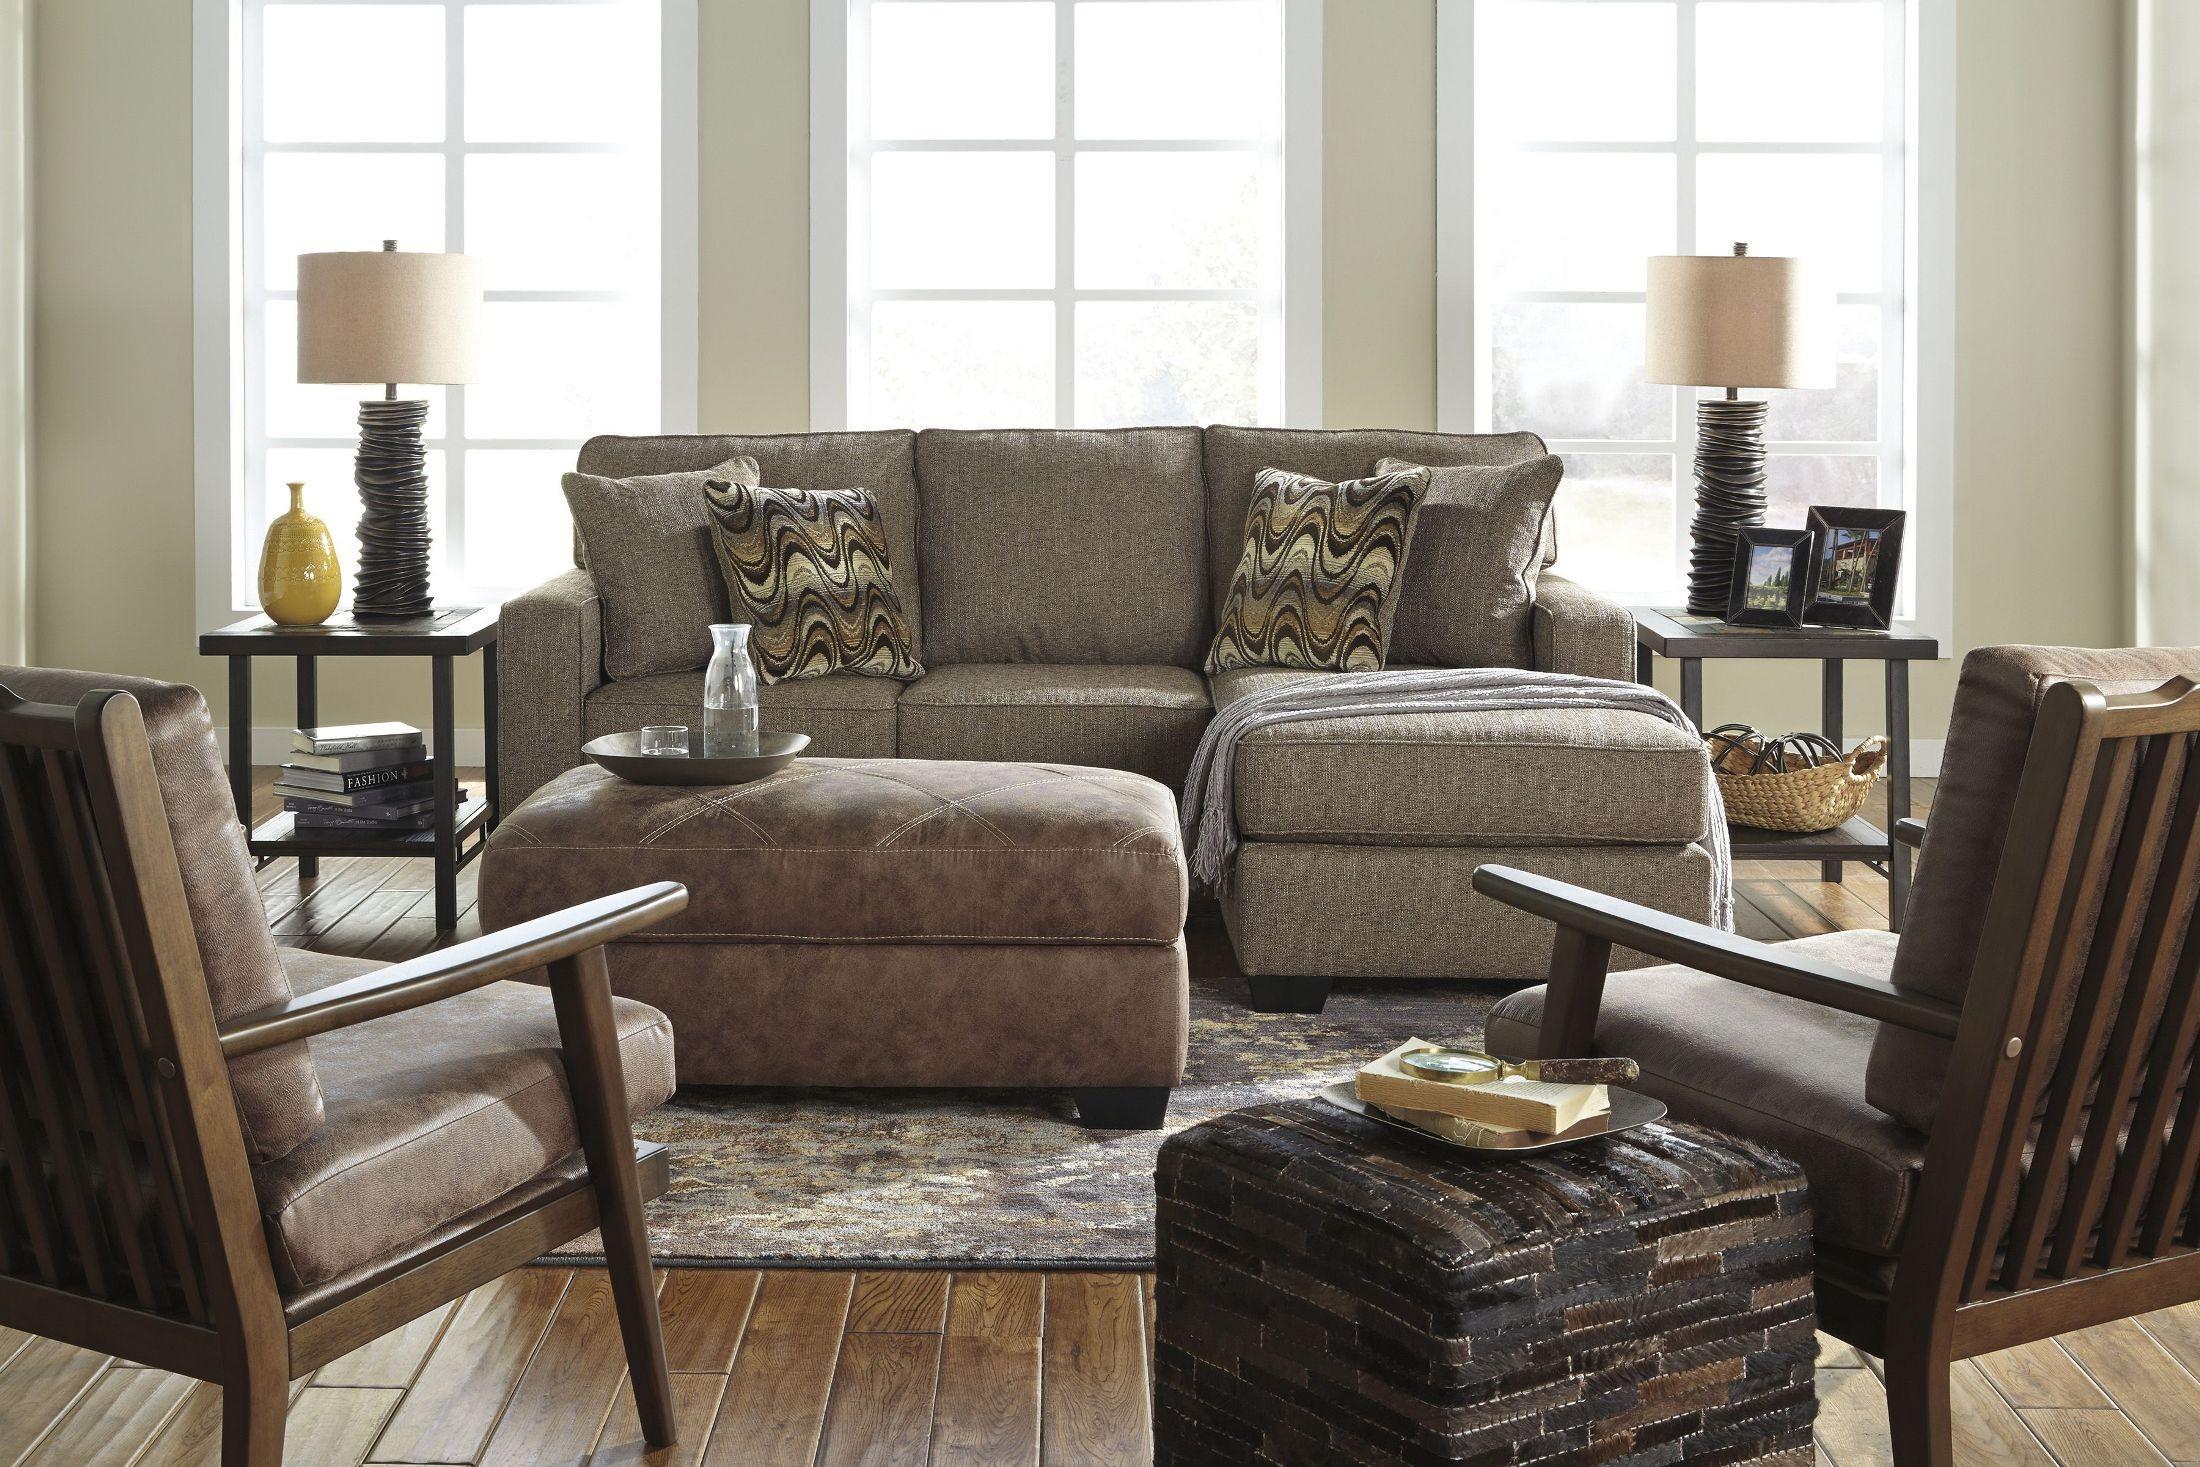 lauren ashley 60 zero wall sofa recliner italian designs india tanacra tweed living room set from coleman furniture